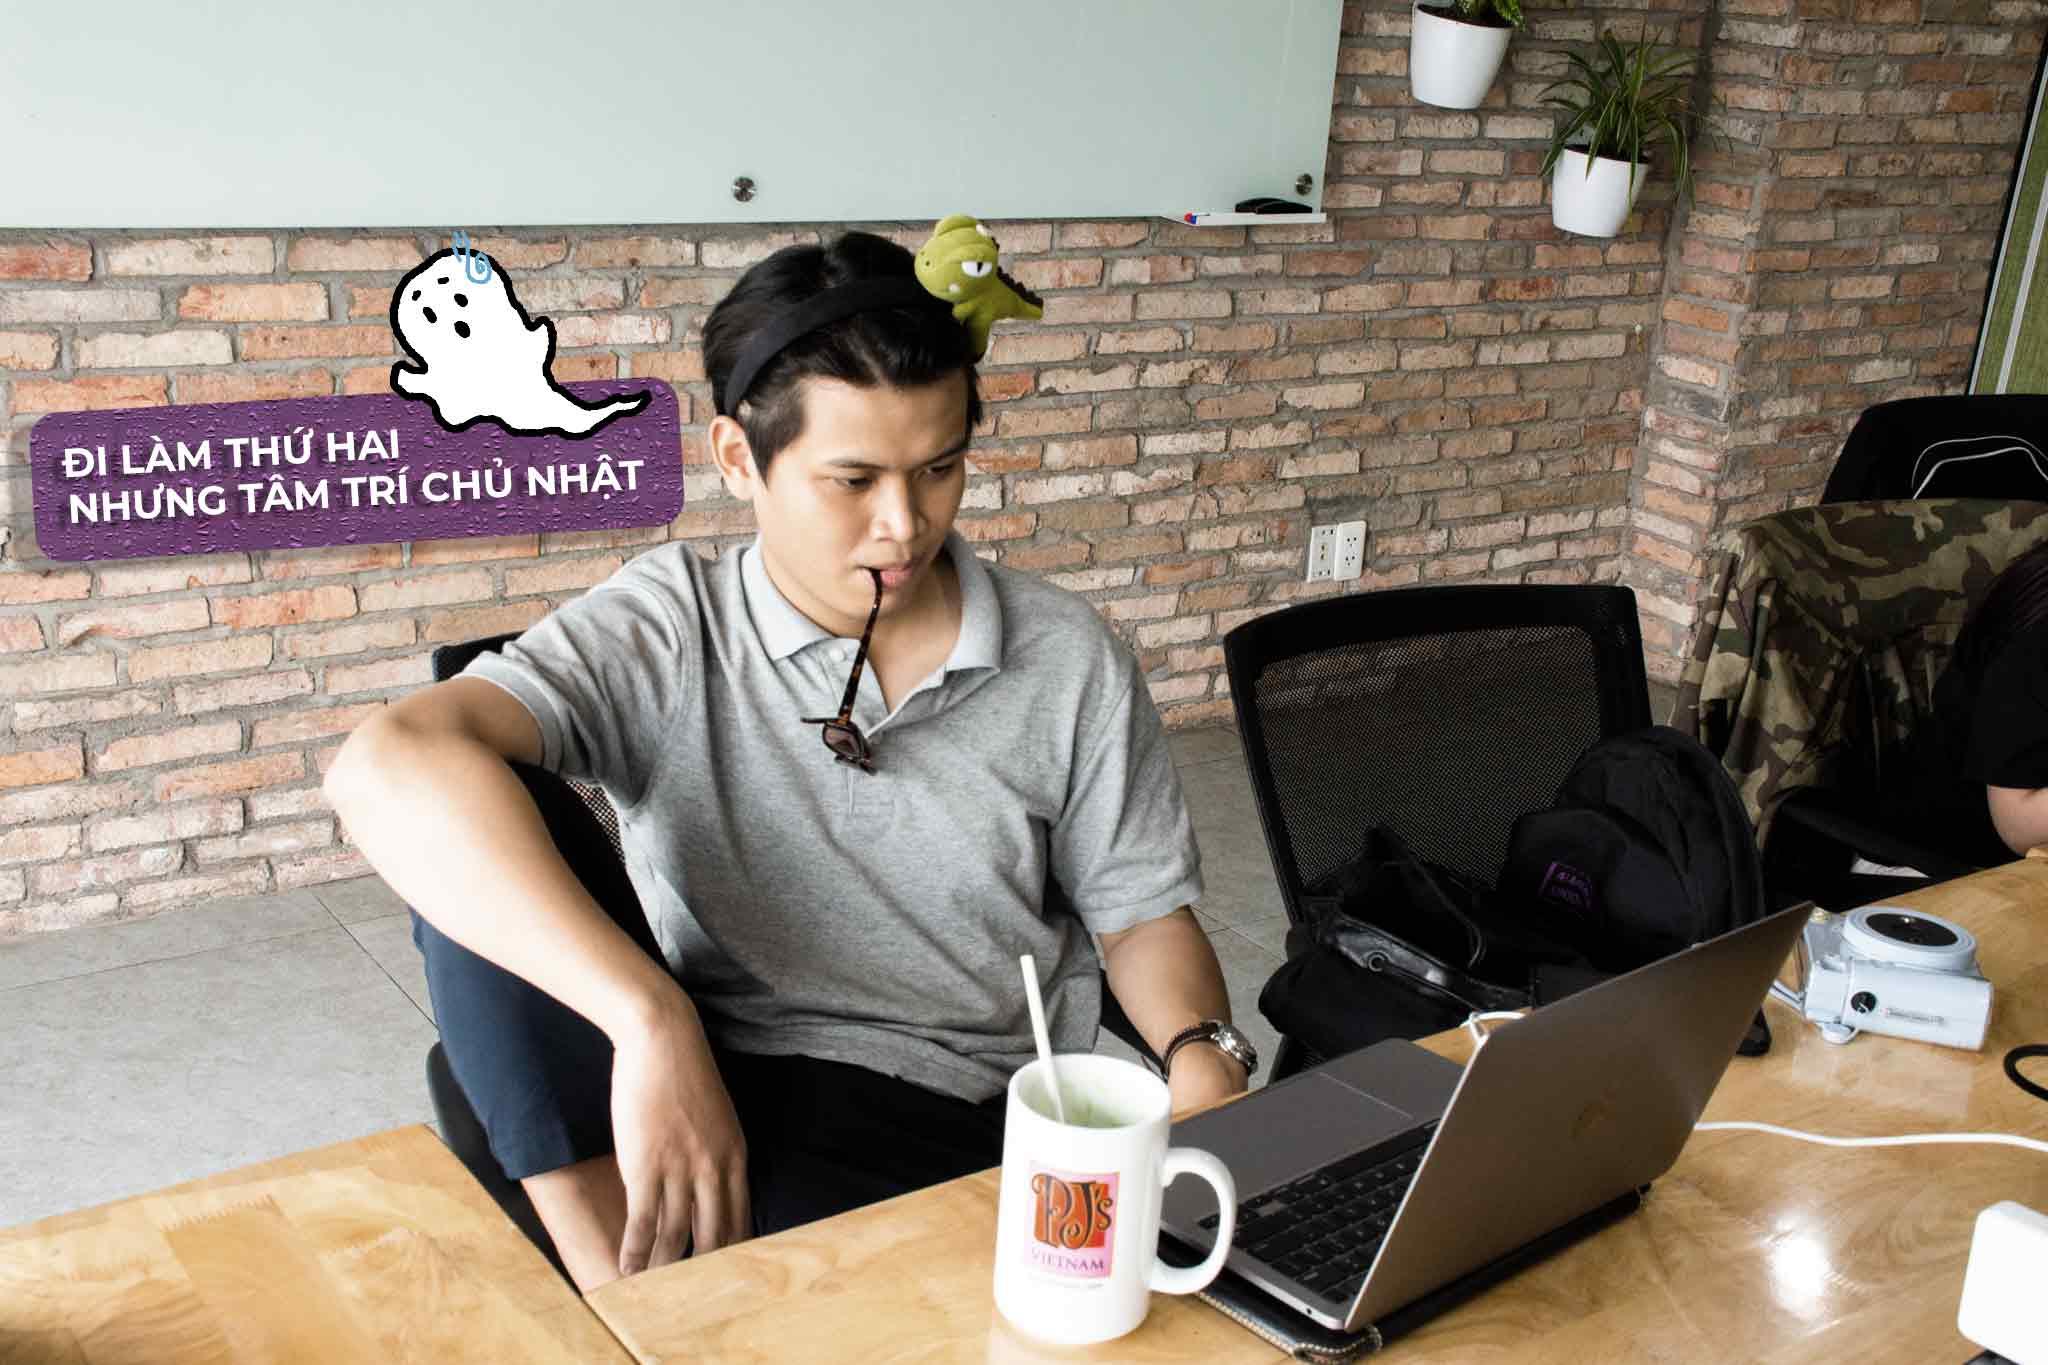 The perccentage of Professionalism factors